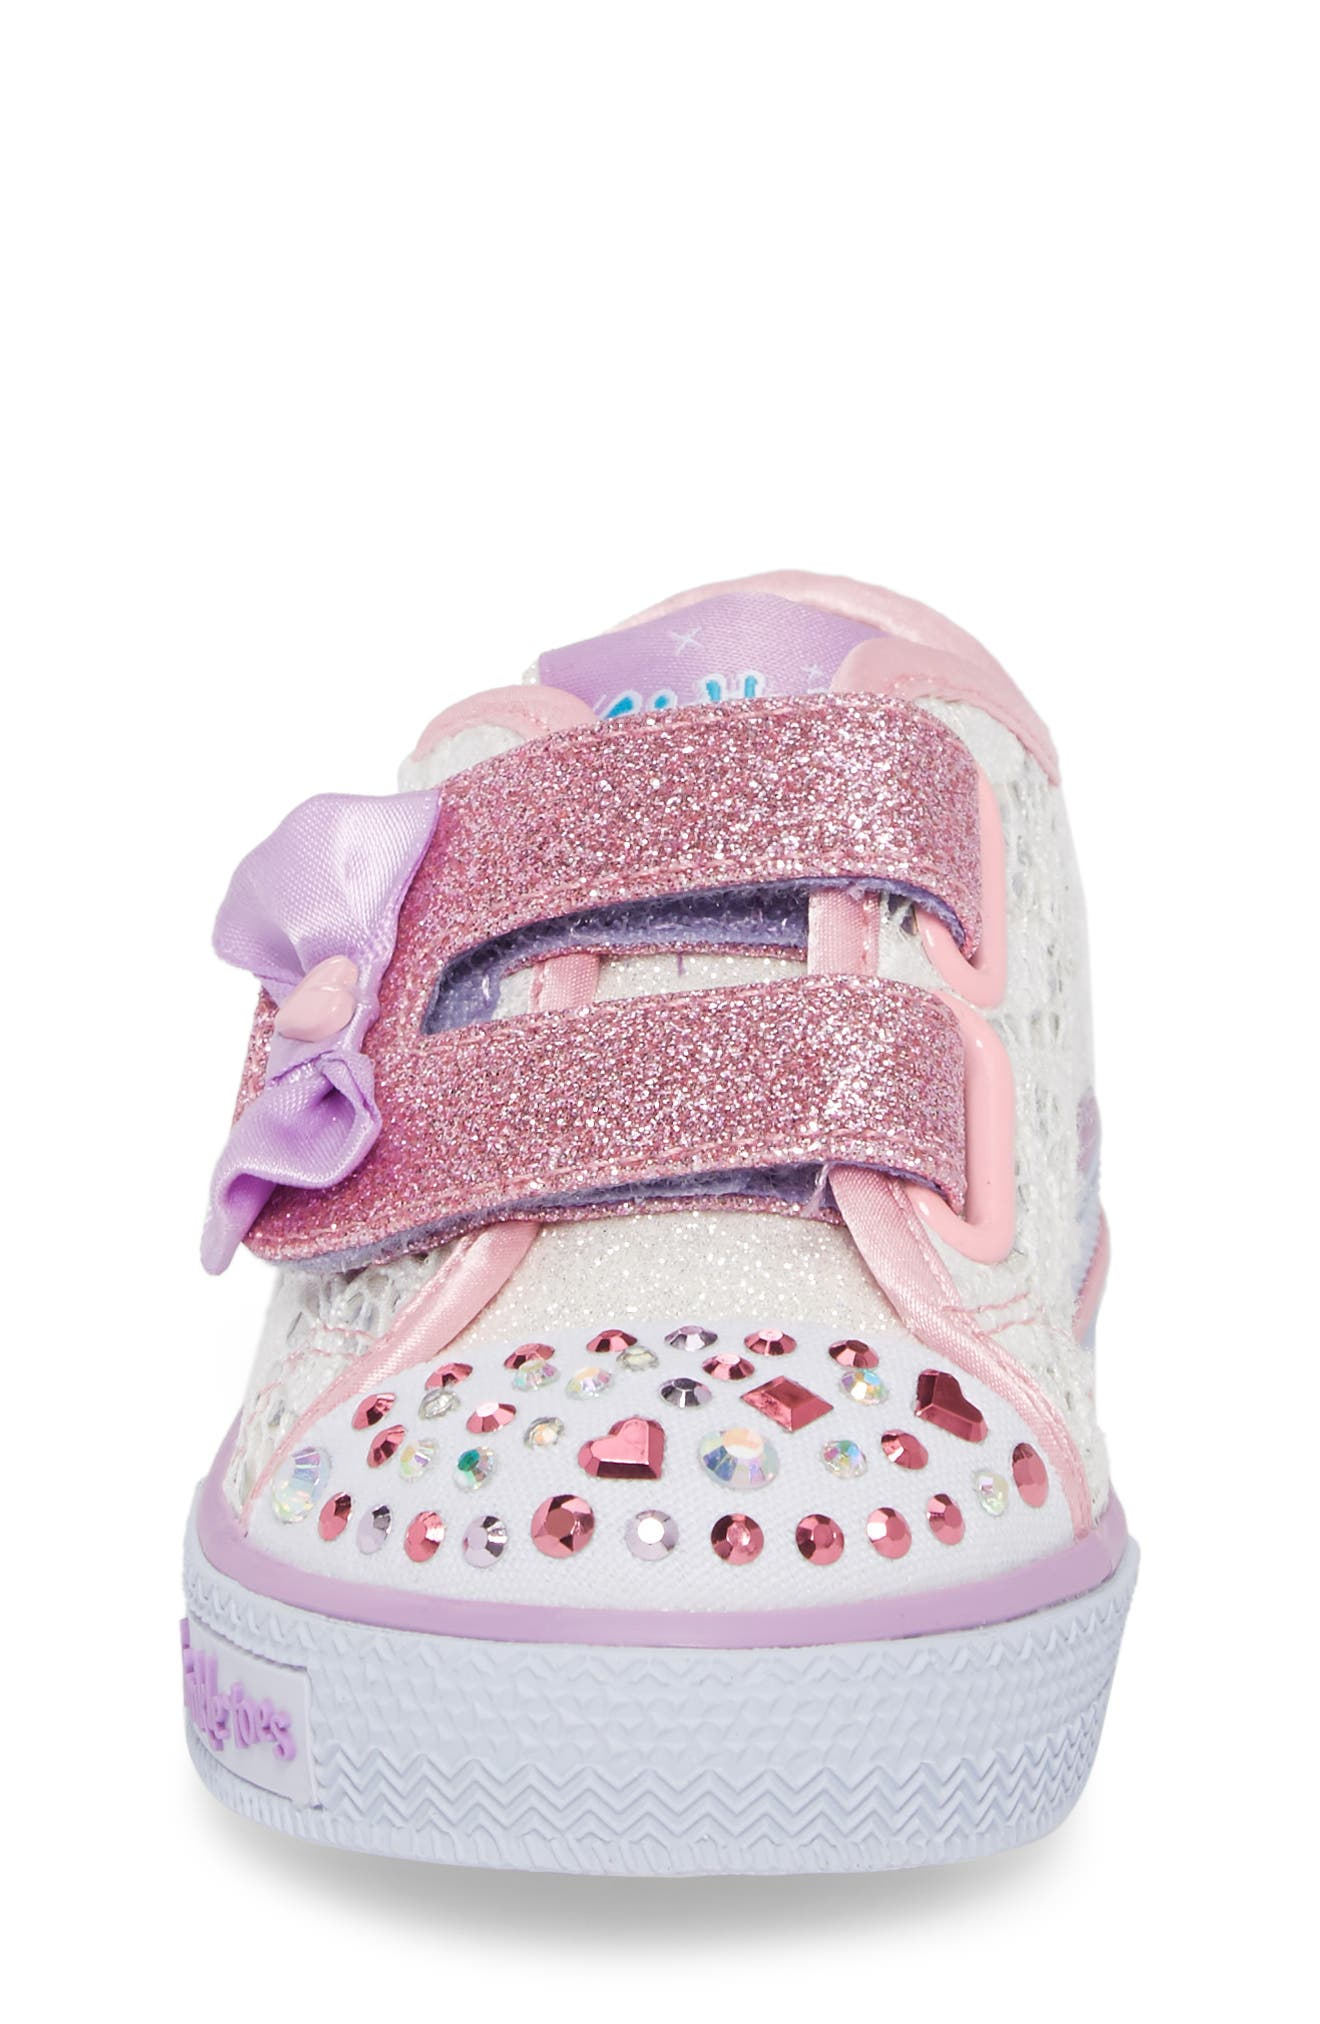 Twinkle Toes Shuffles Light-Up Glitter Sneaker,                             Alternate thumbnail 4, color,                             White/ Silver/ Light Pink